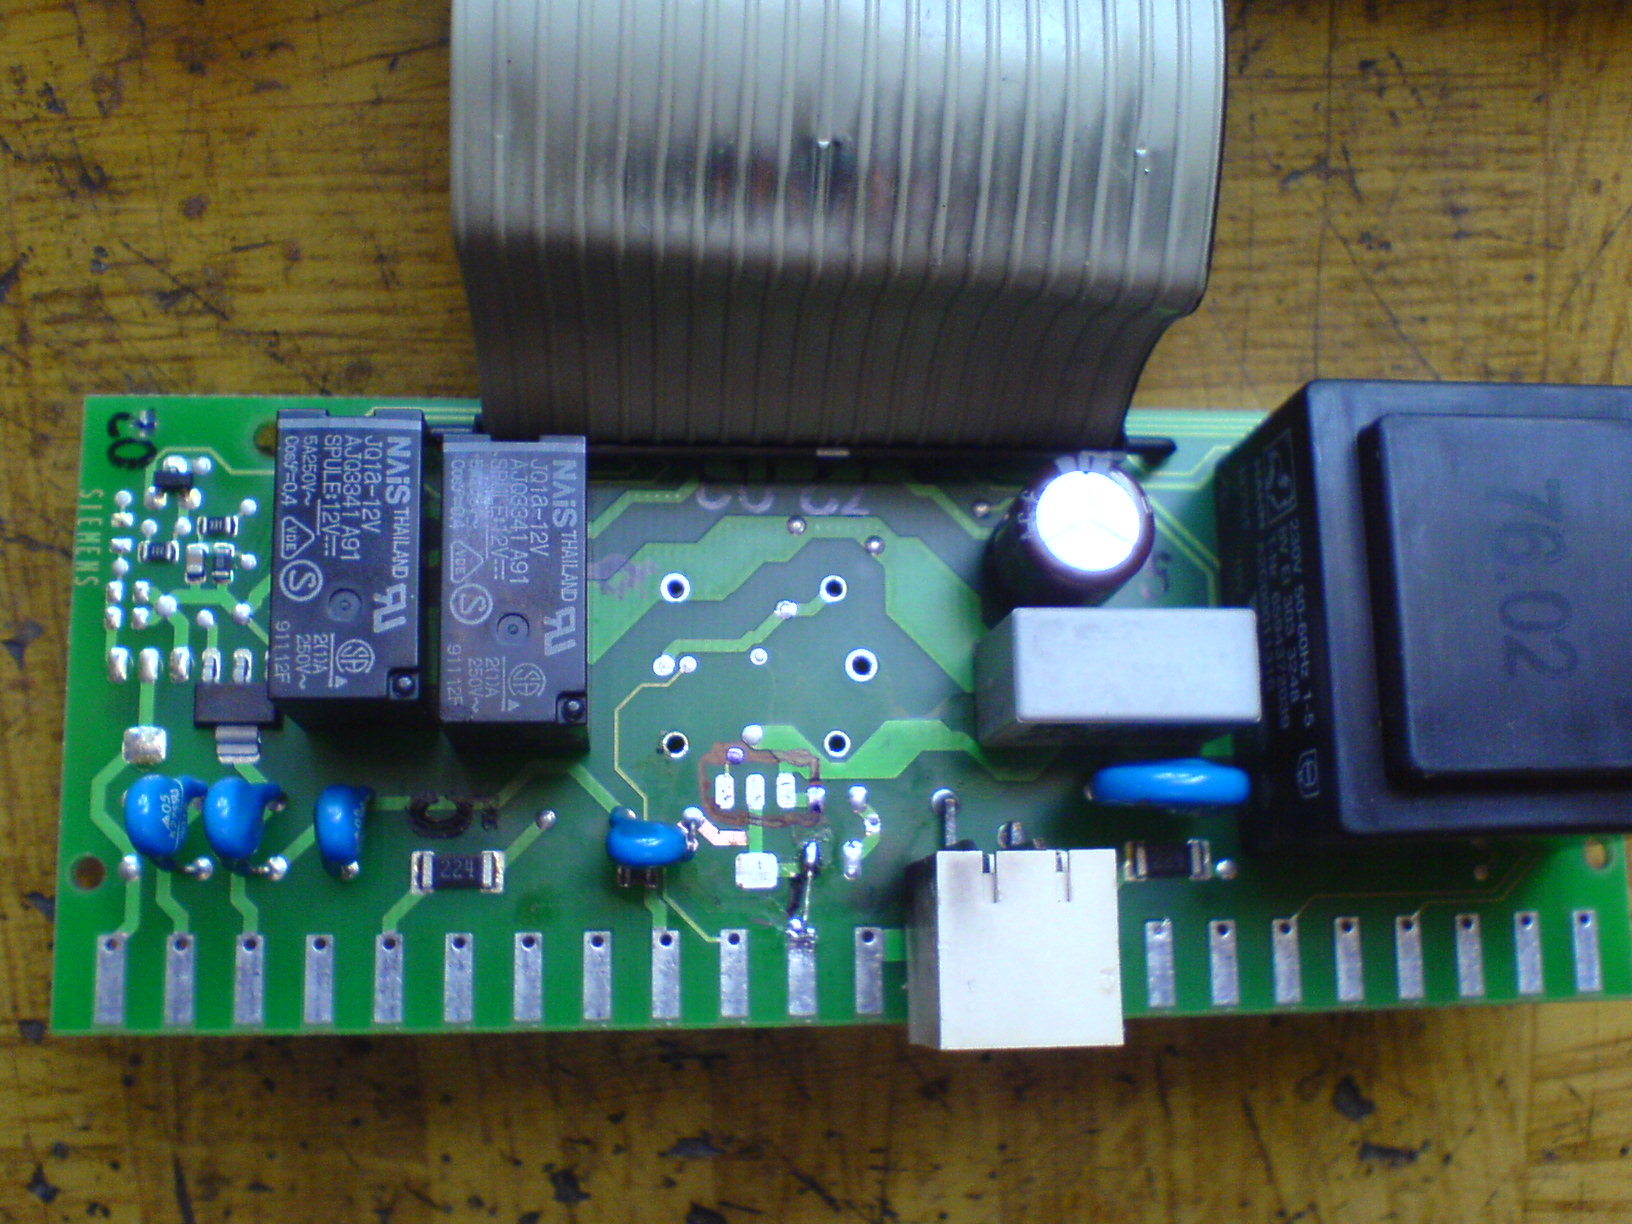 zmywarka Bosch SGS5622 - Pytanie o element programatora